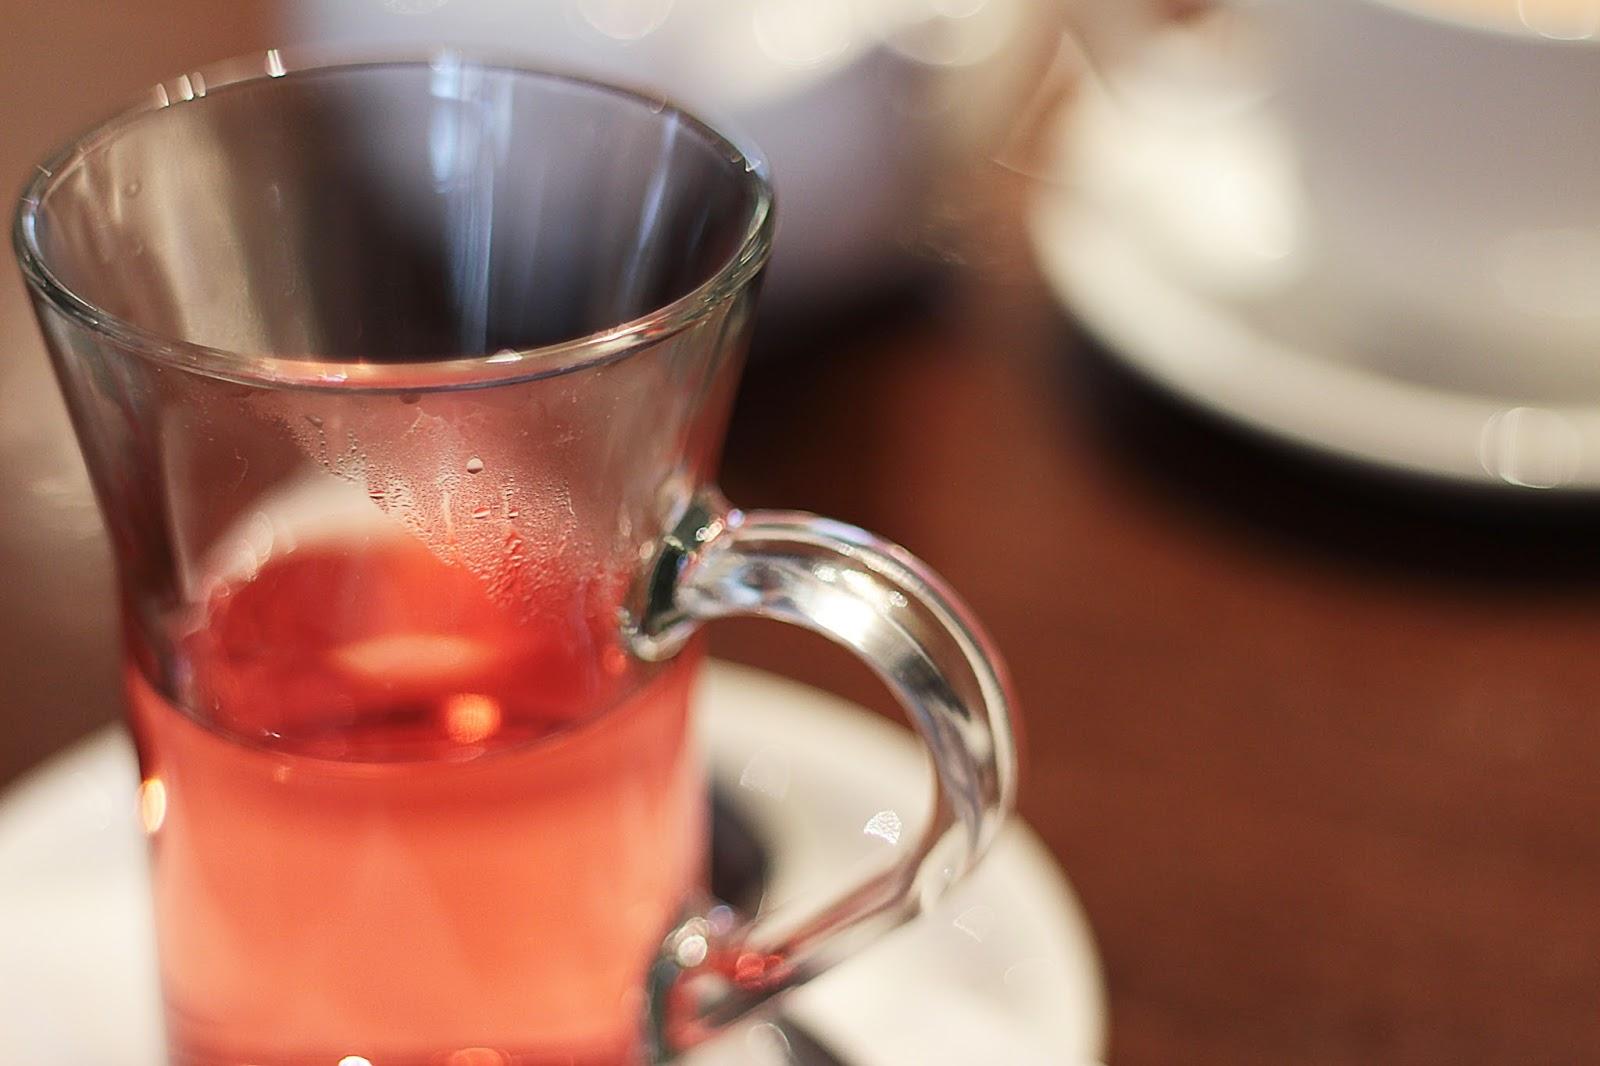 andrews cafe tea rooms sheffield raspberry elder-flower tea